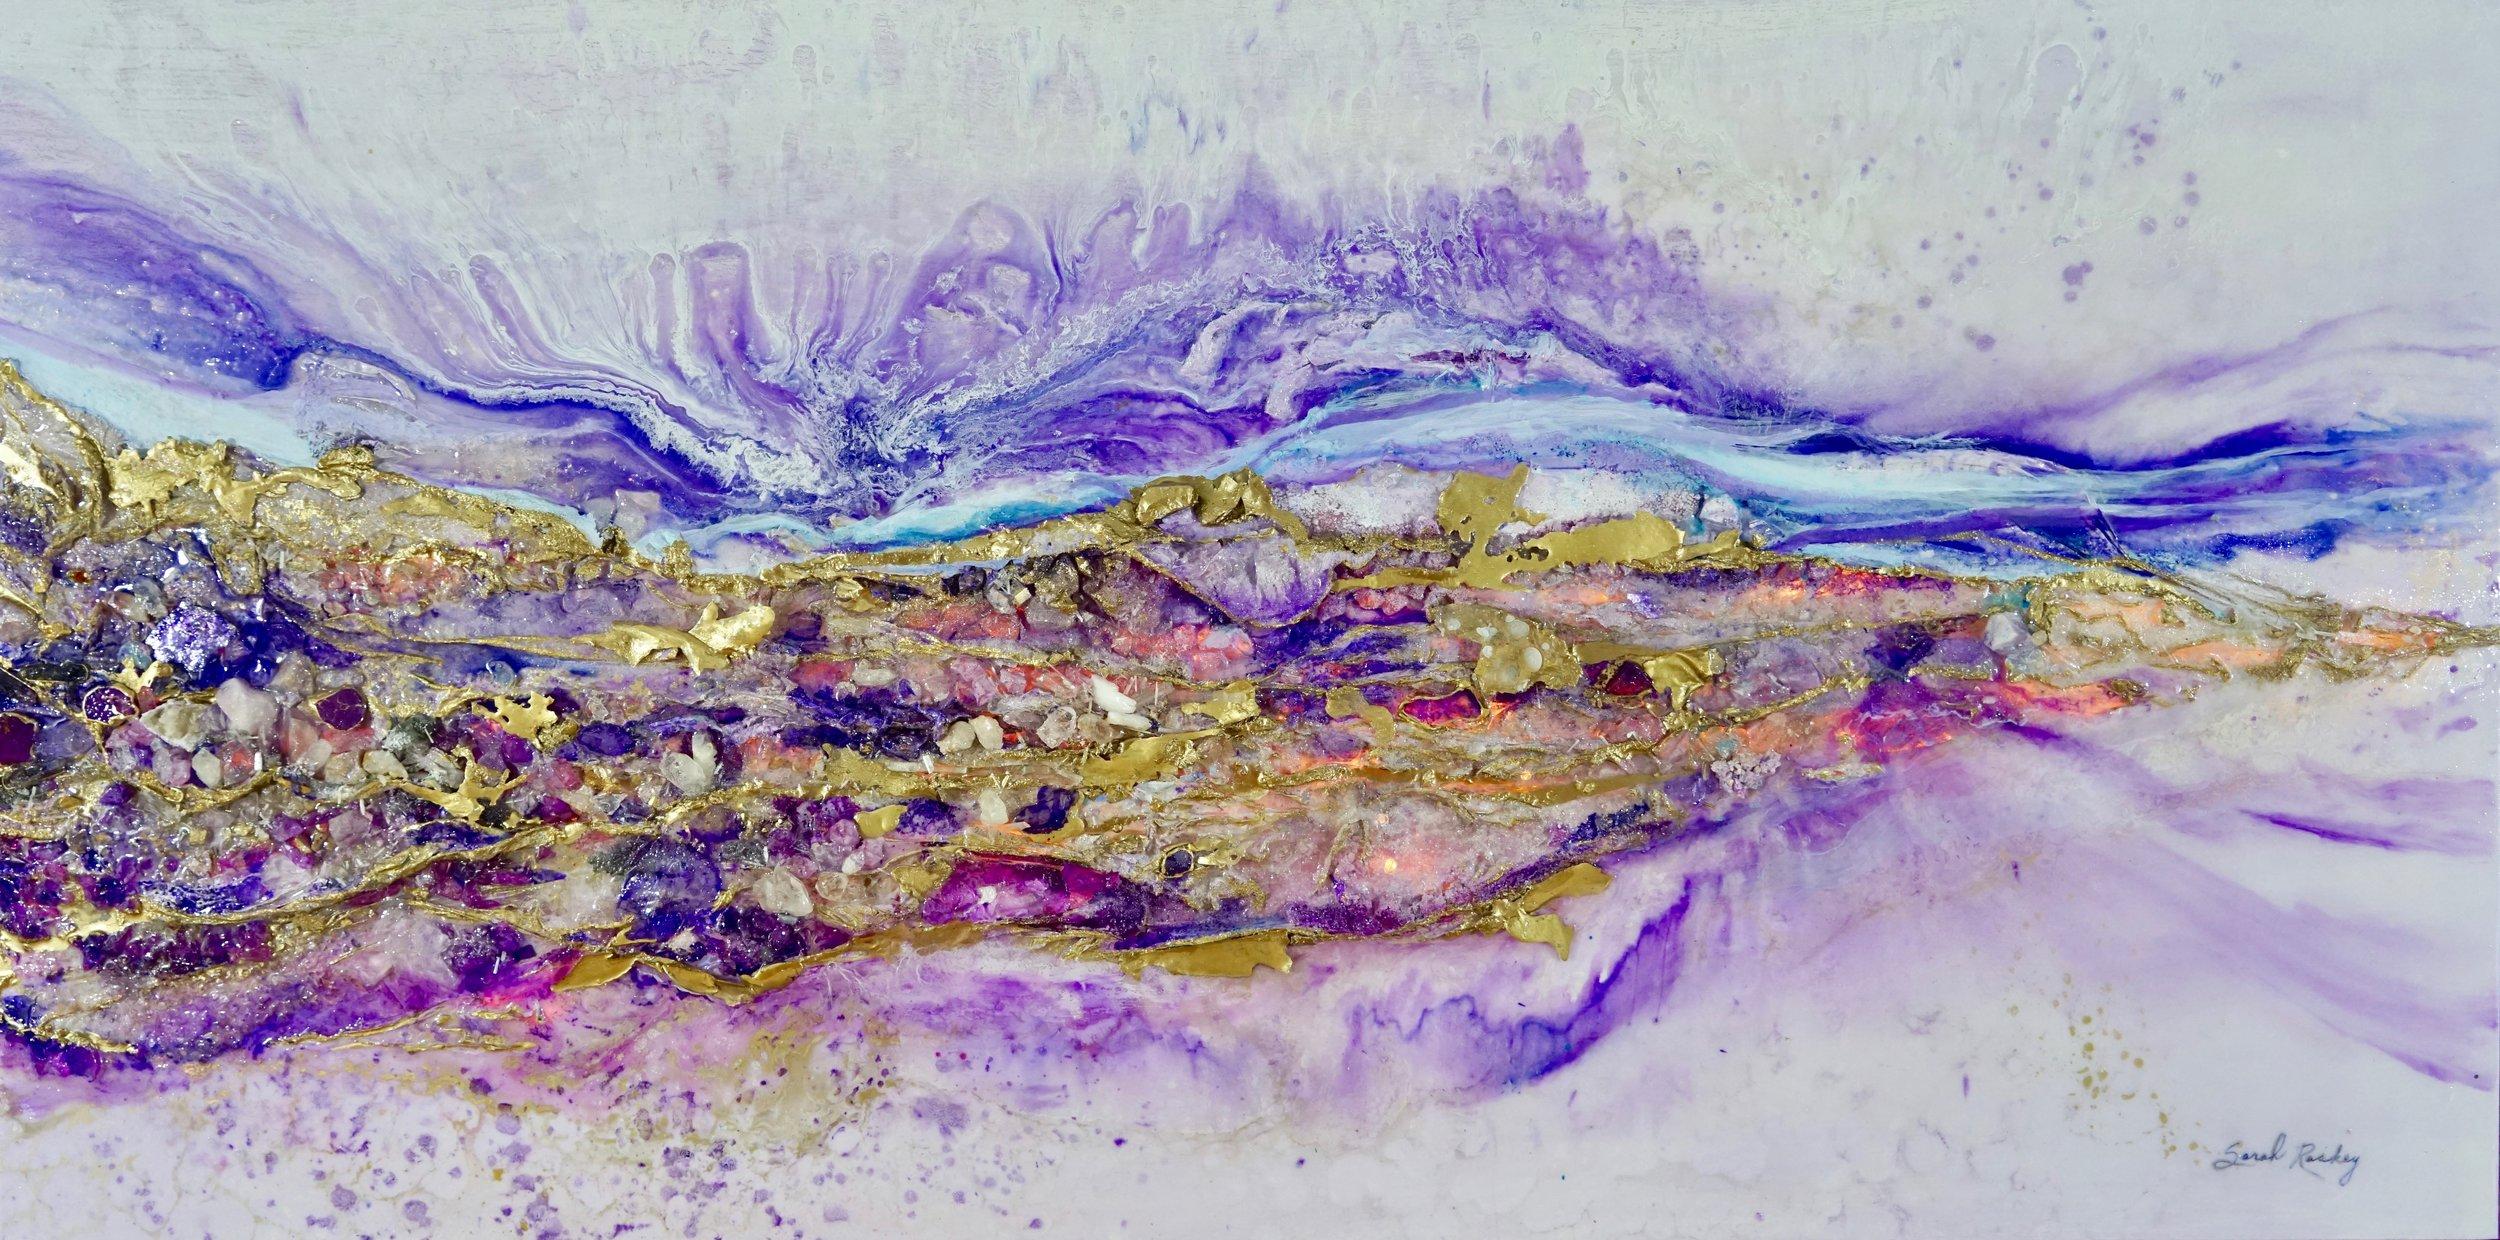 WAVES OF LOVE THROUGH ROLLING STONES - SARAH RASKEY FINE ART